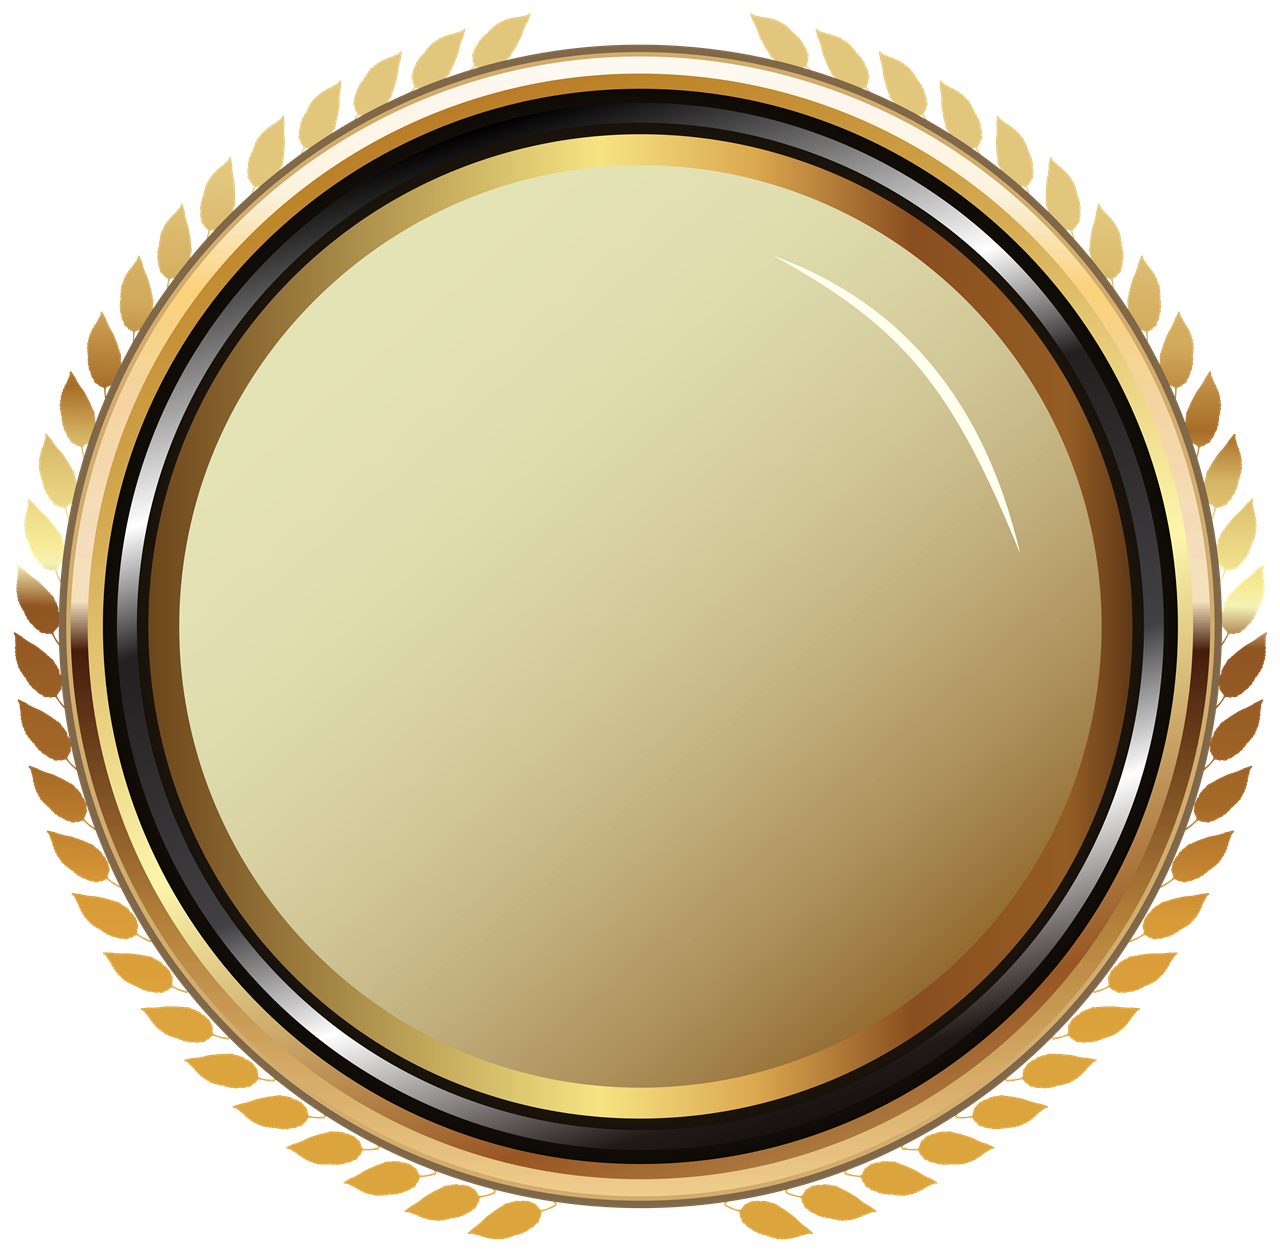 Golden Badge PNG Image Background PNG Arts 1280x1252